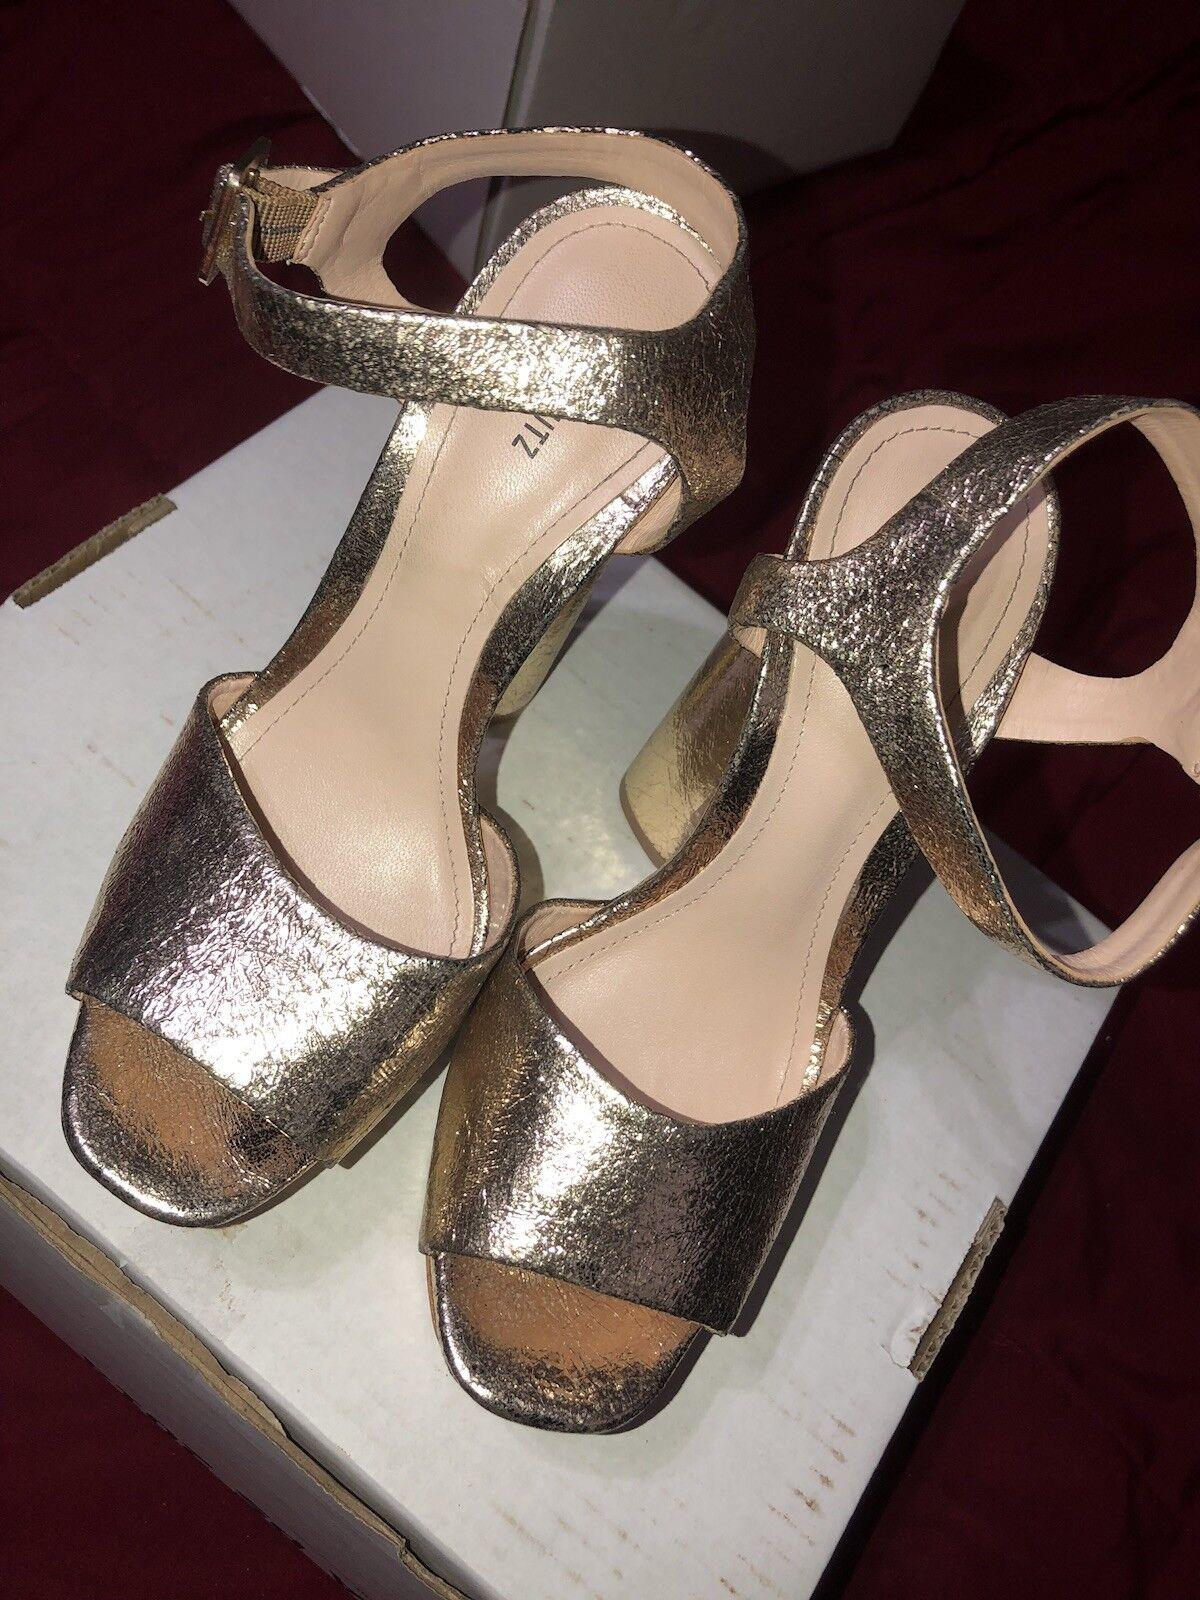 Jane schutz Platform In Platina gold  Size 6.5 open Toe Chunky heel